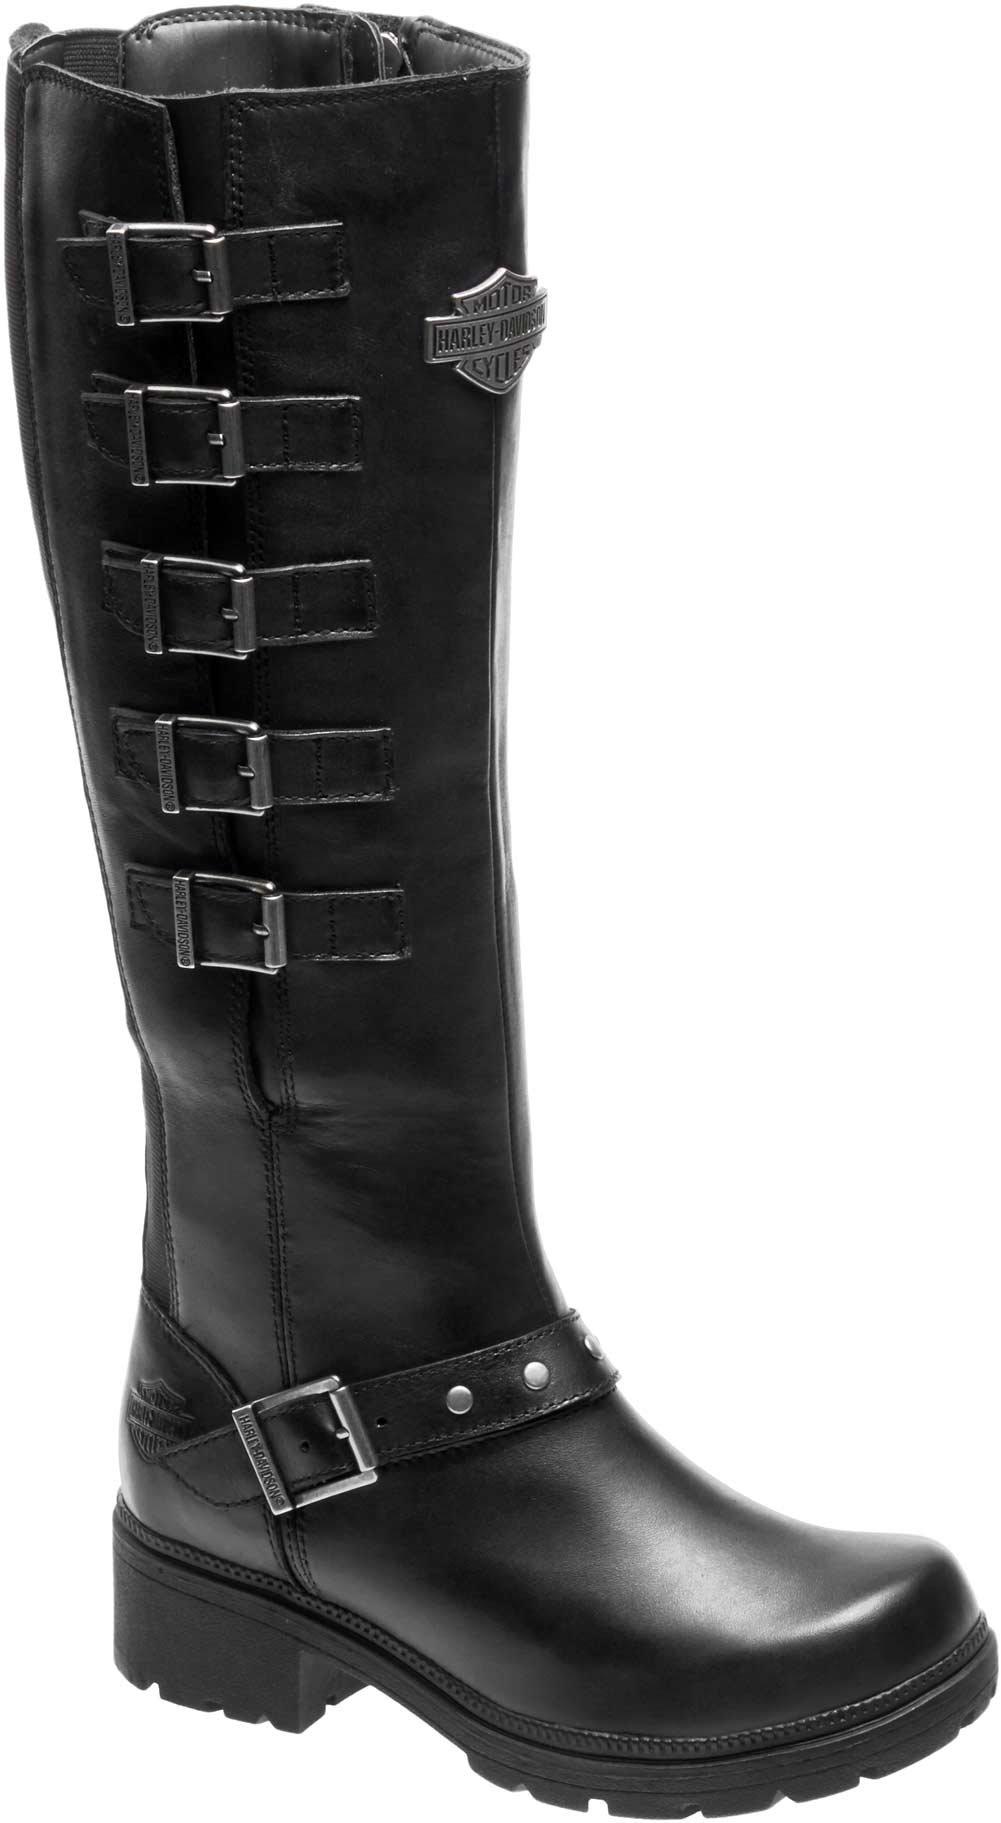 Harley-Davidson Women's Glassford Work Boot, Black, 8 M US